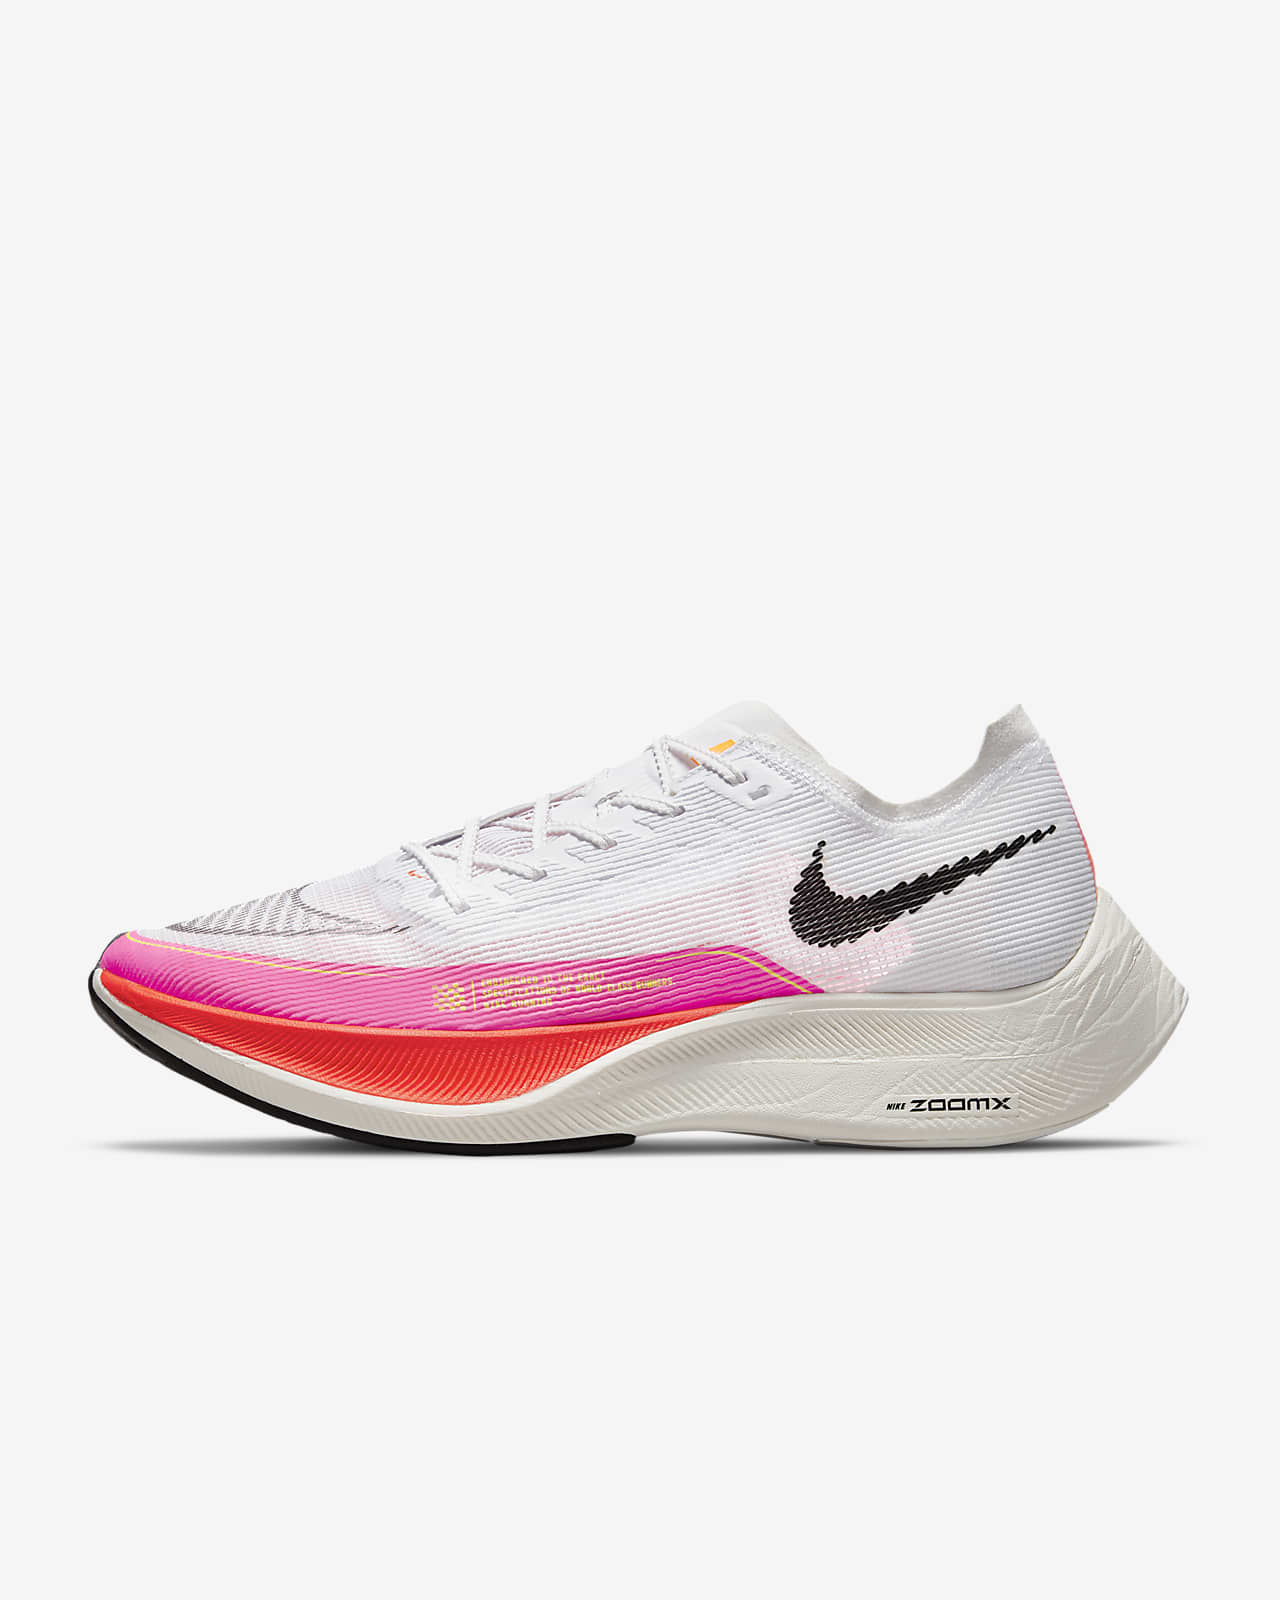 Calzado de carrera para hombre Nike ZoomX Vaporfly Next% 2